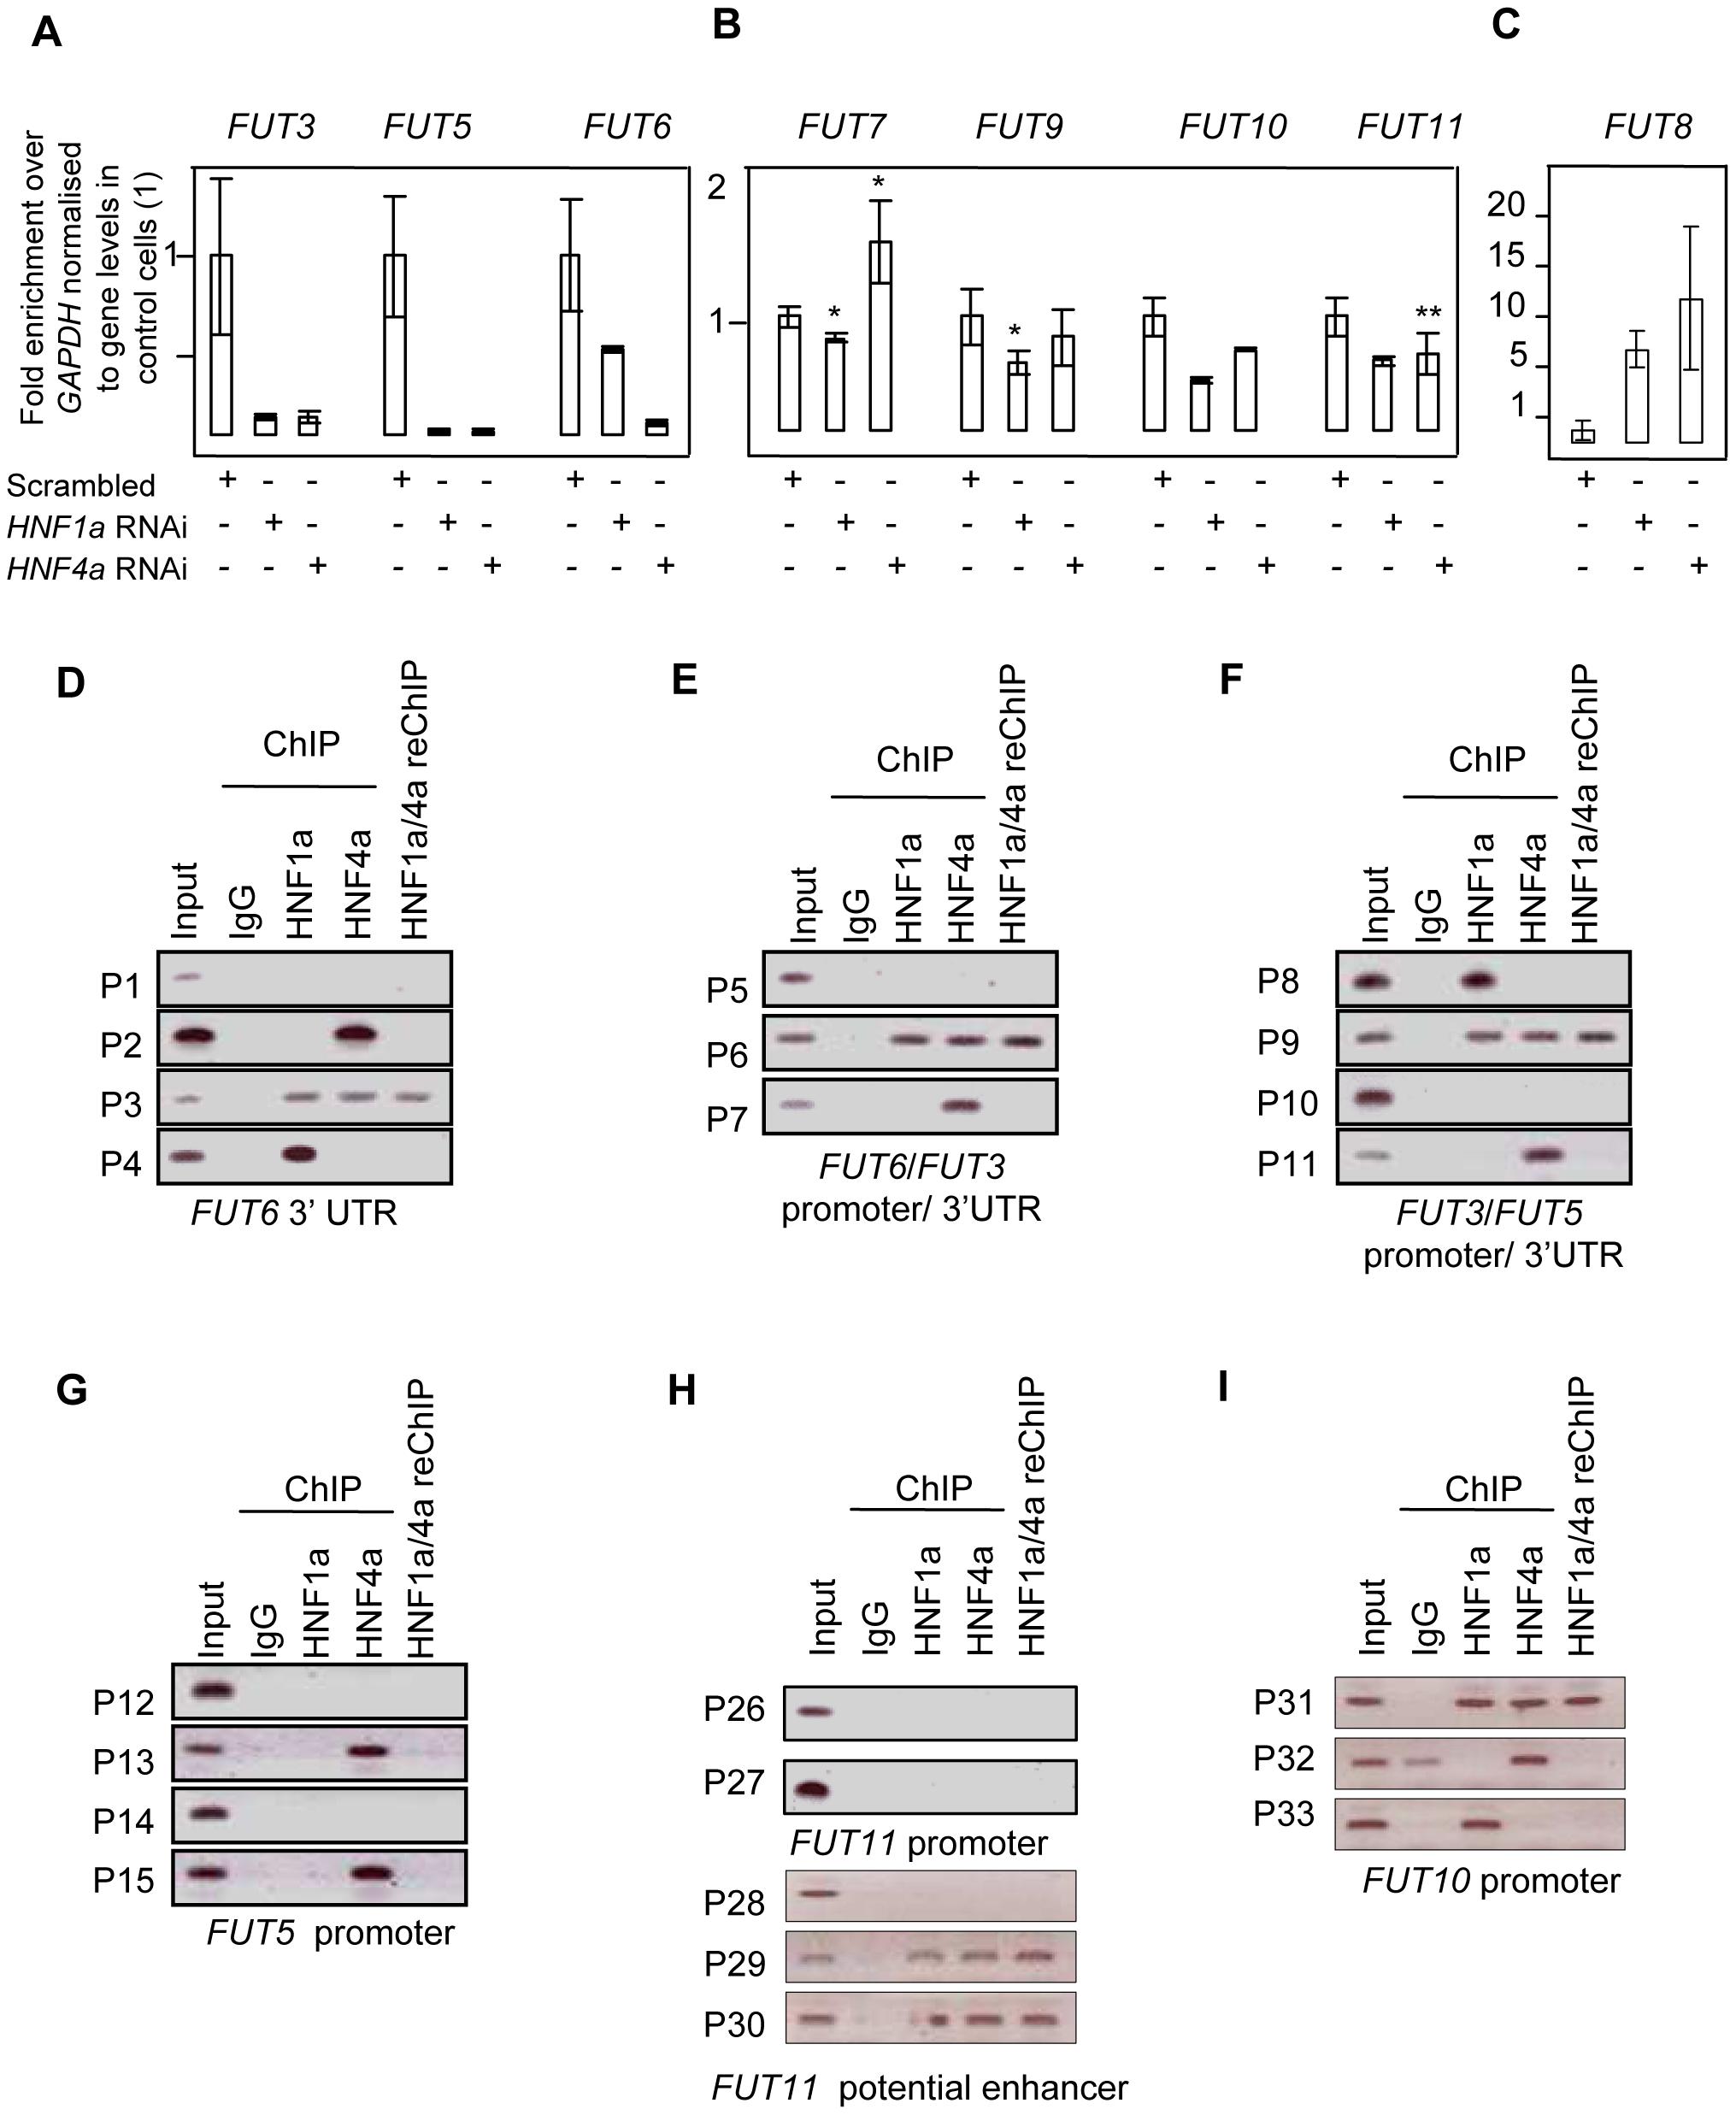 HNF1α is major regulator of the fucosyltransferase genes.